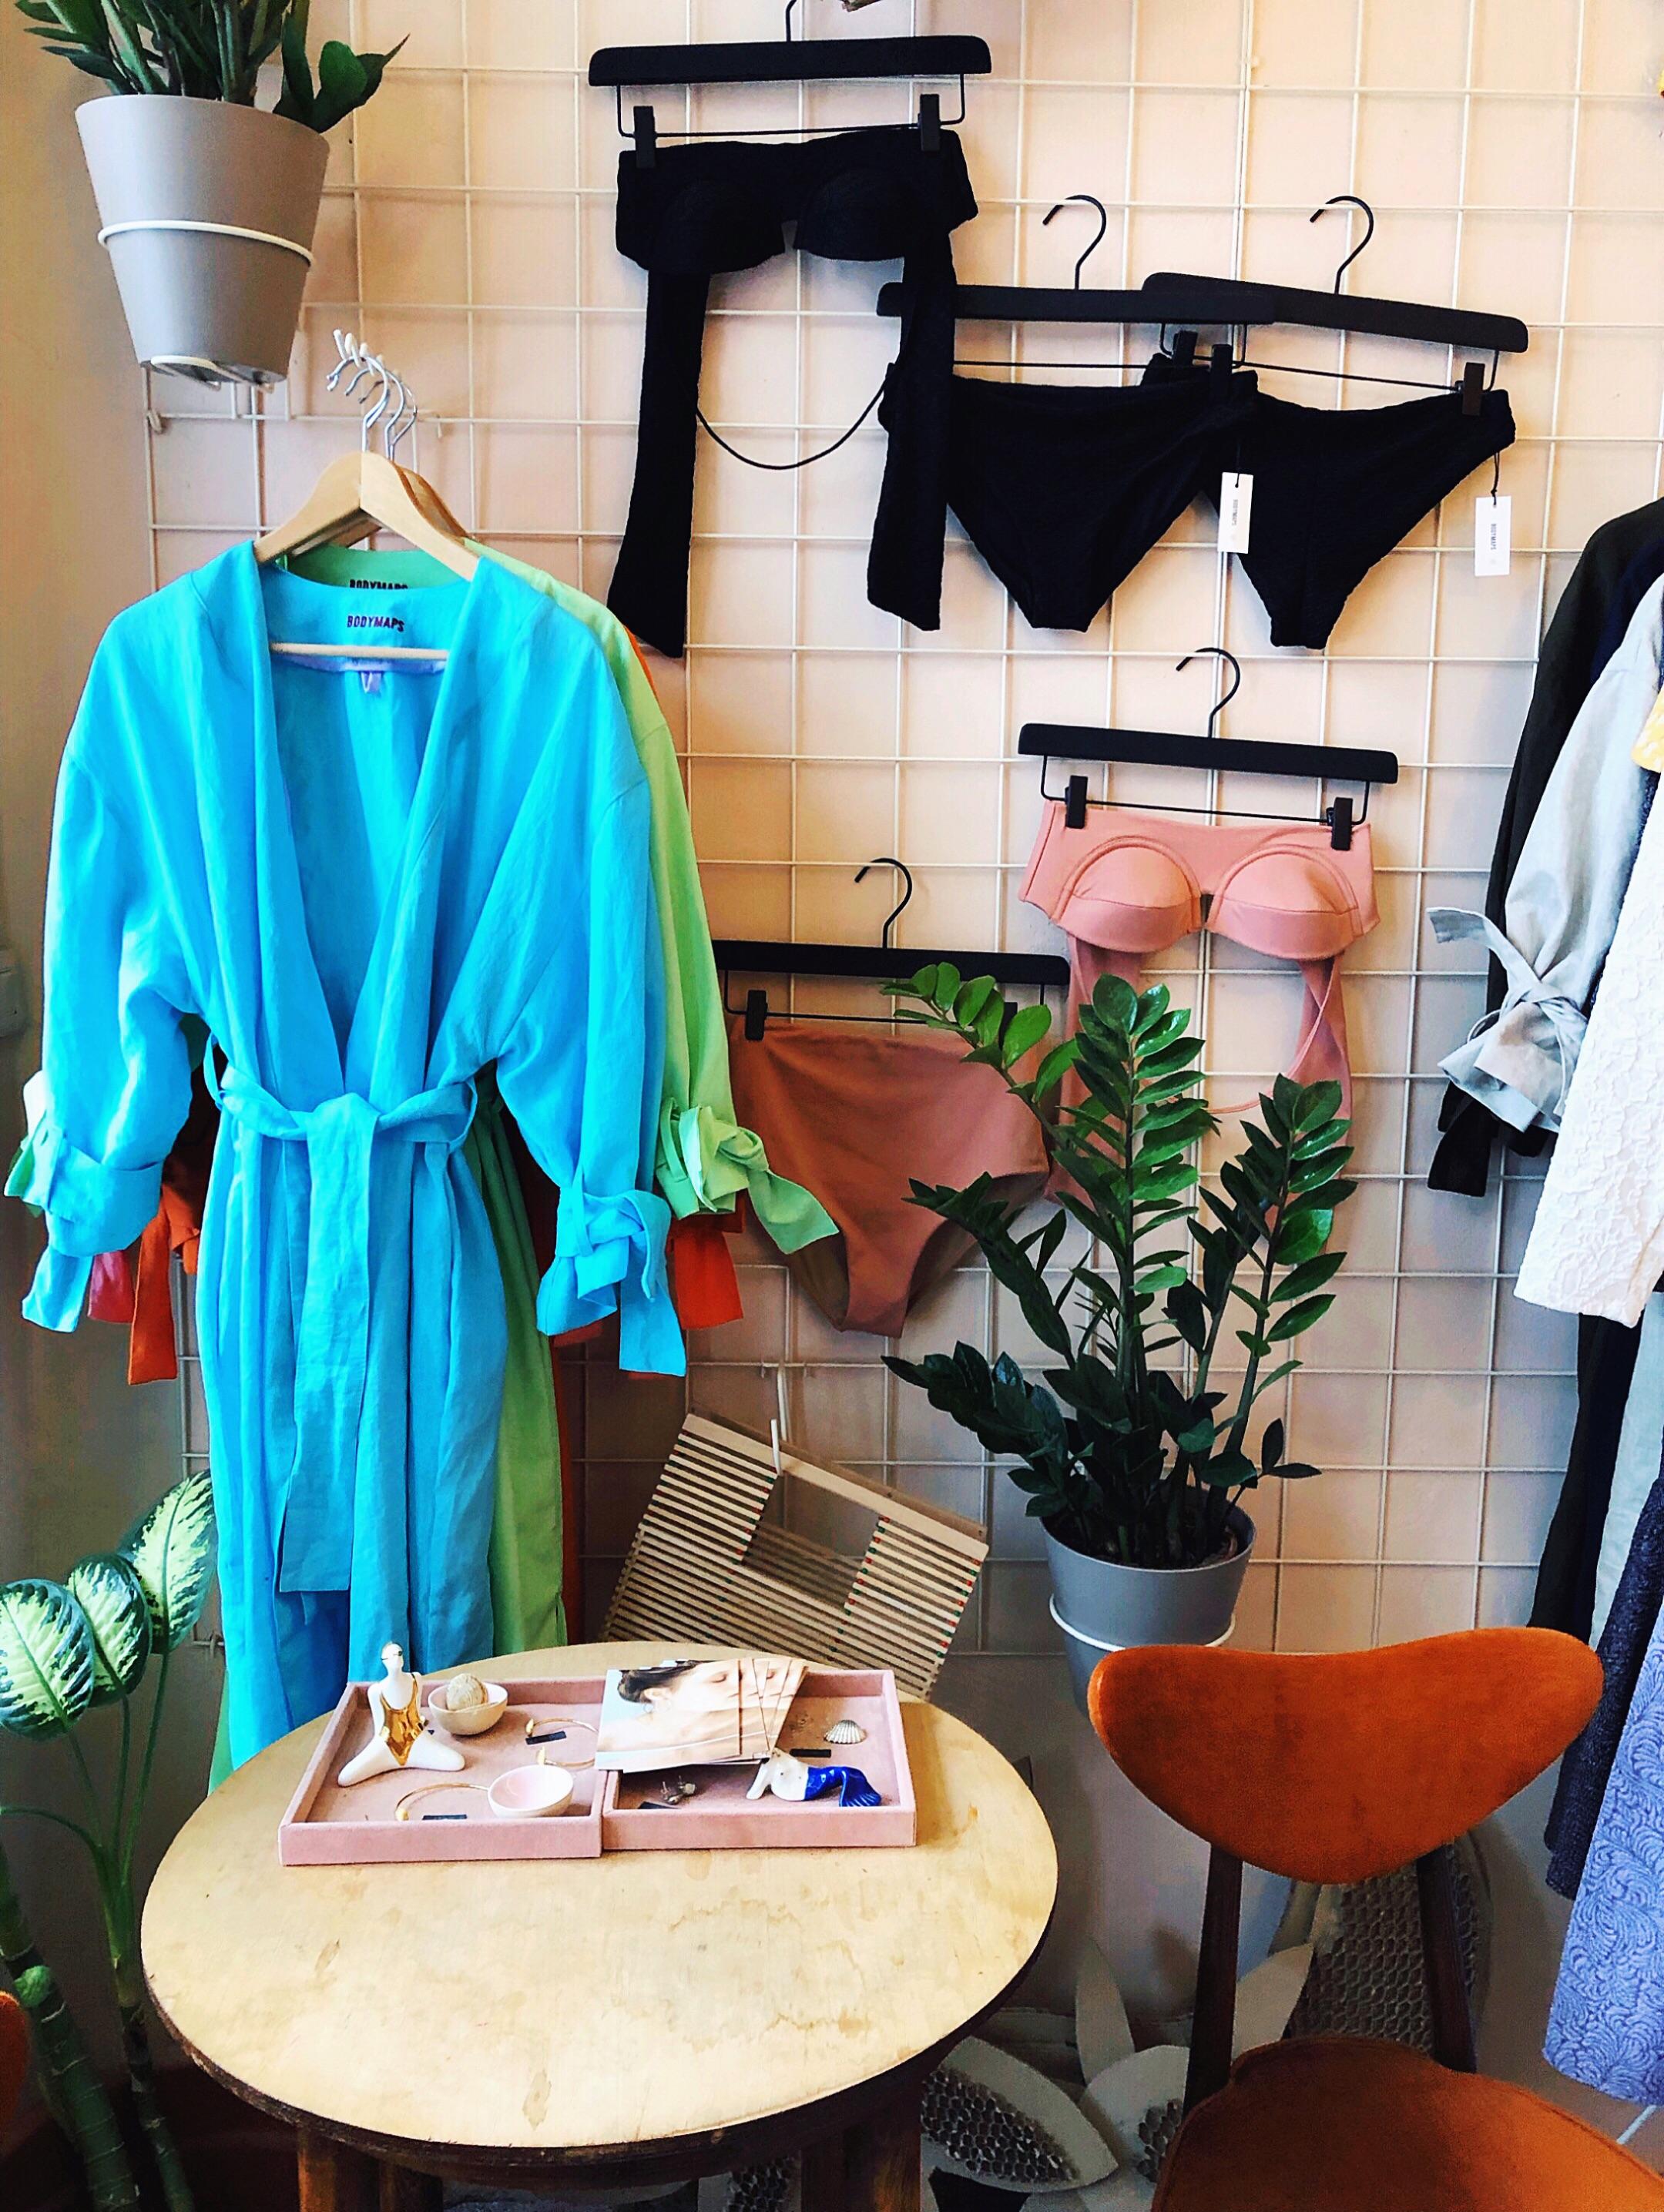 Inside Bodymaps boutique Warsaw